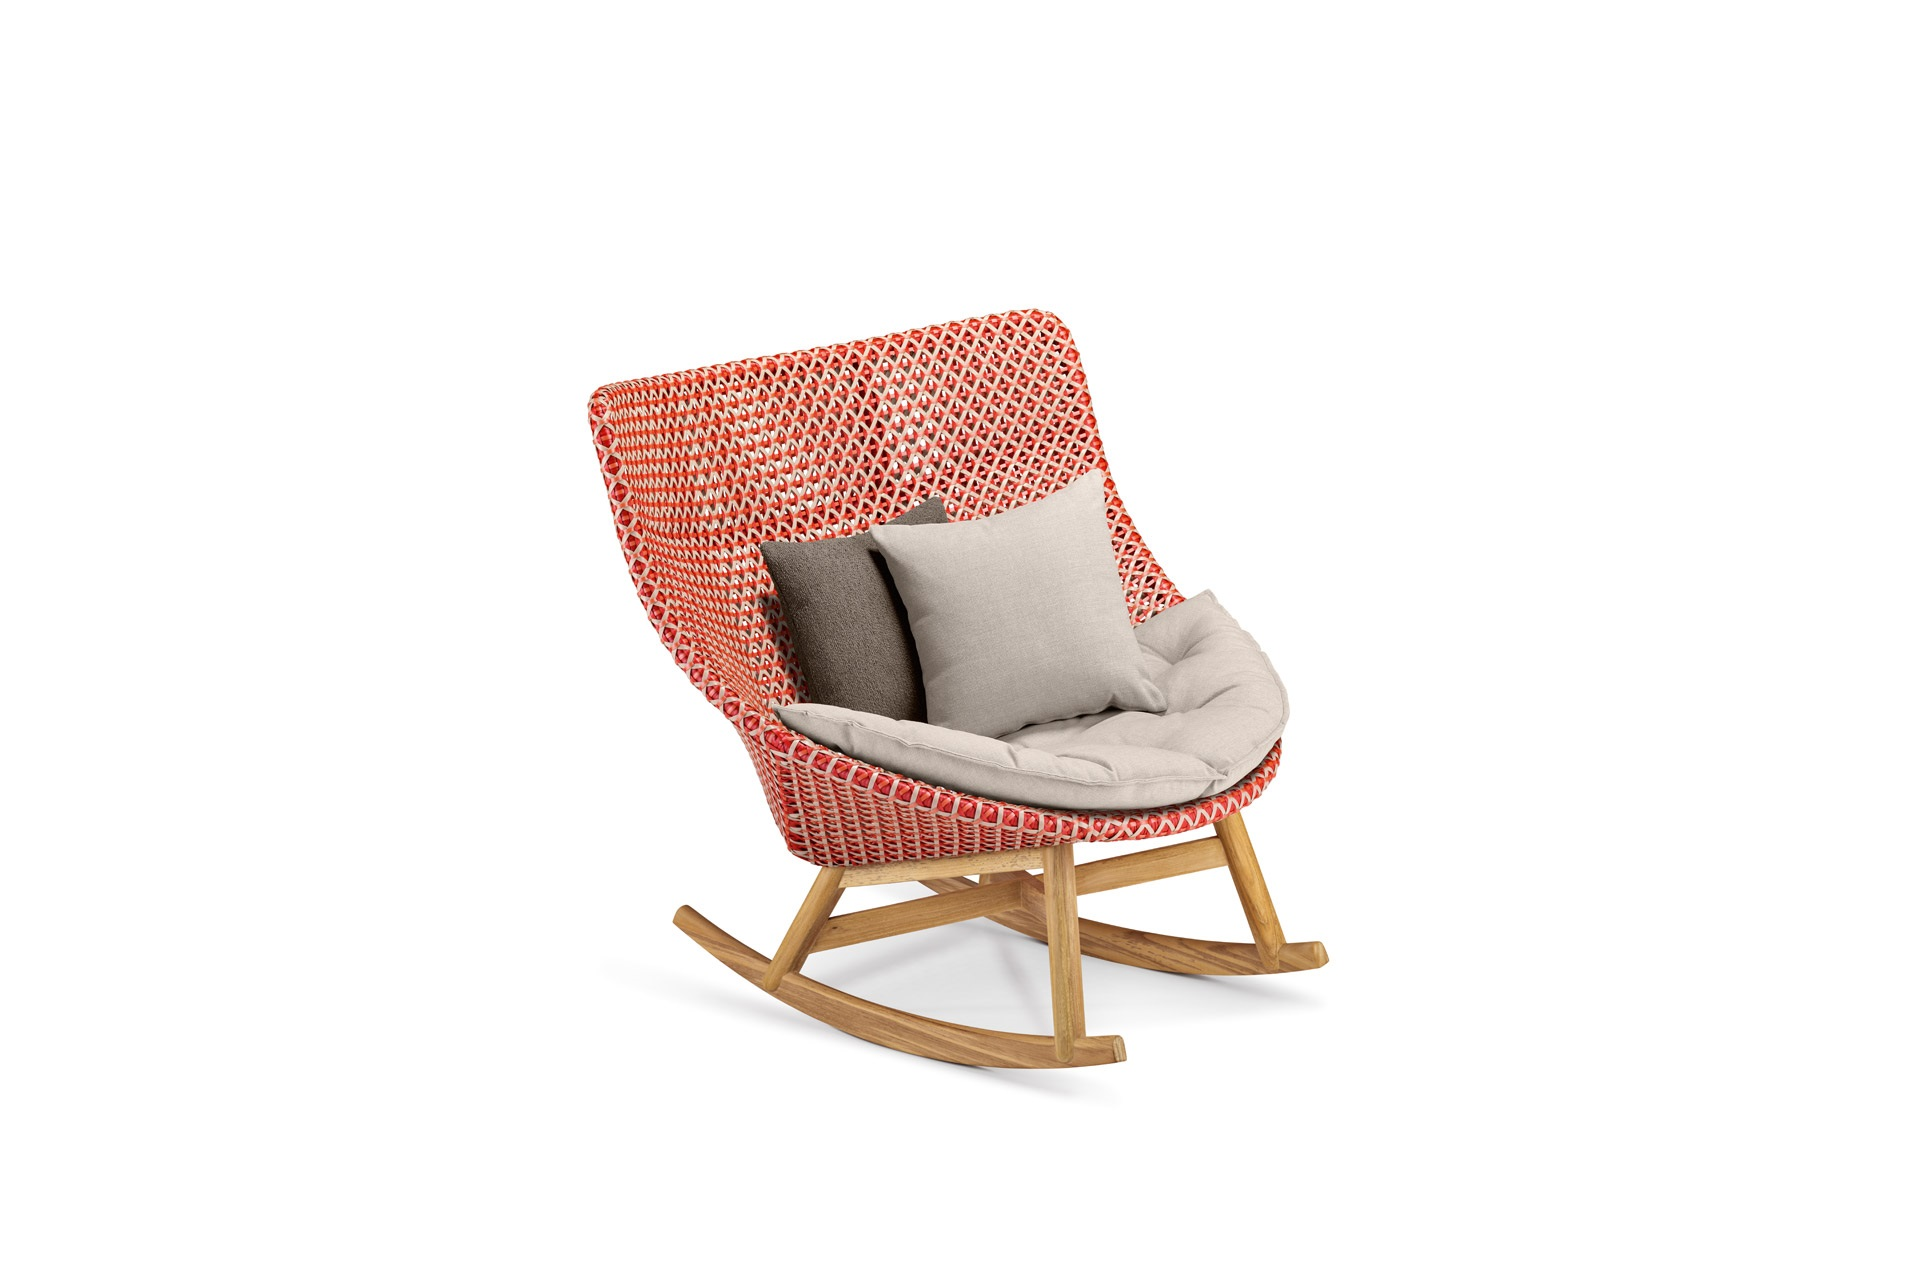 DEDON-Mbrace-Rocking-chair-decocushion-spice